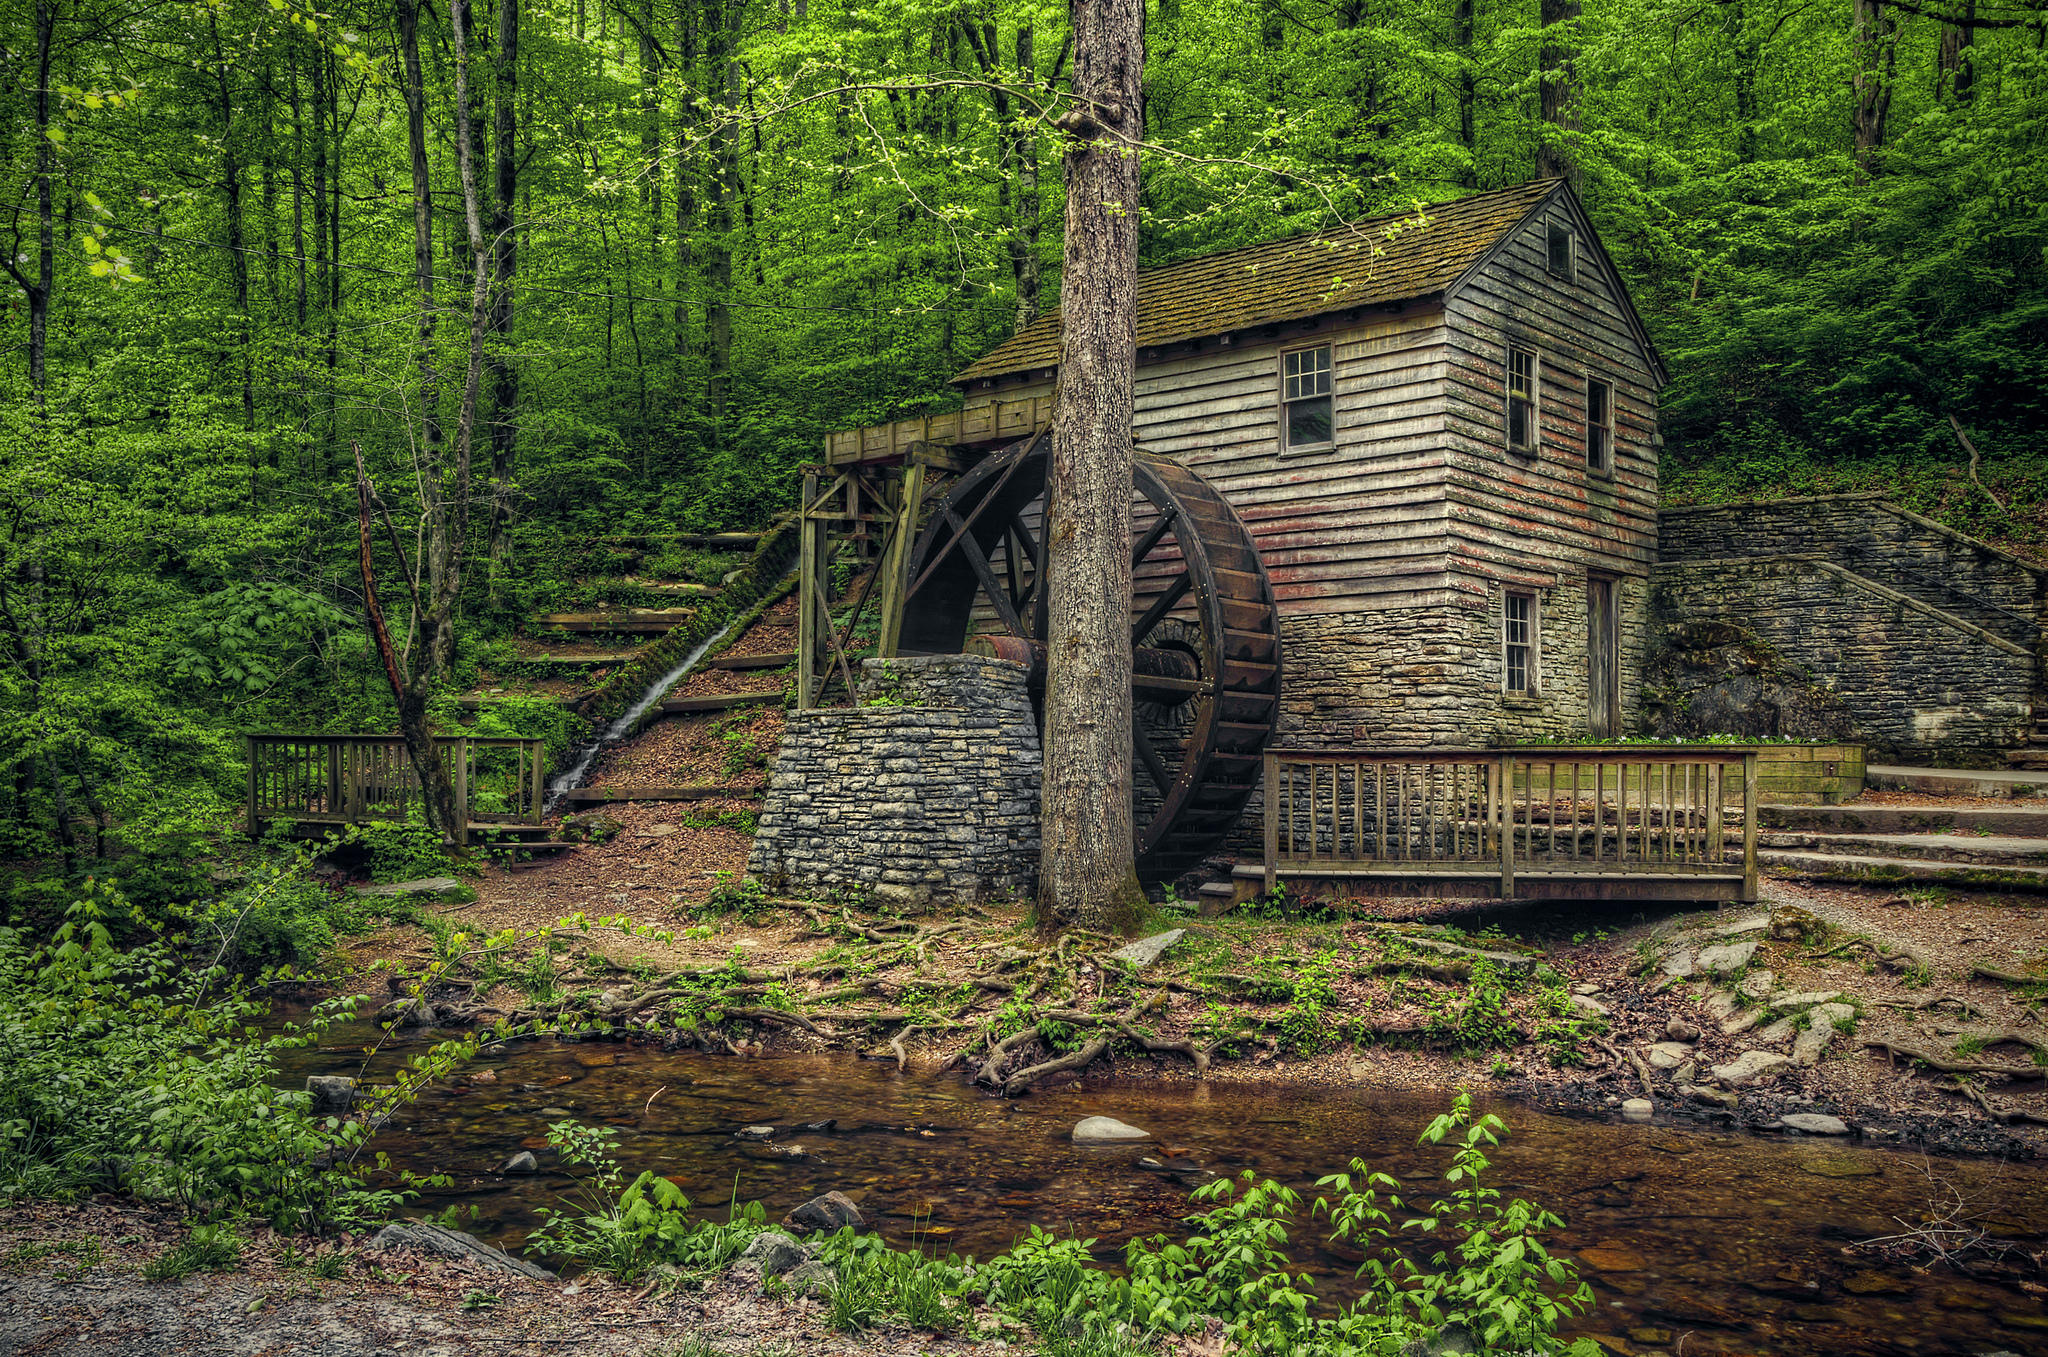 Rice Mill, Norris Dam State Park, Теннесси